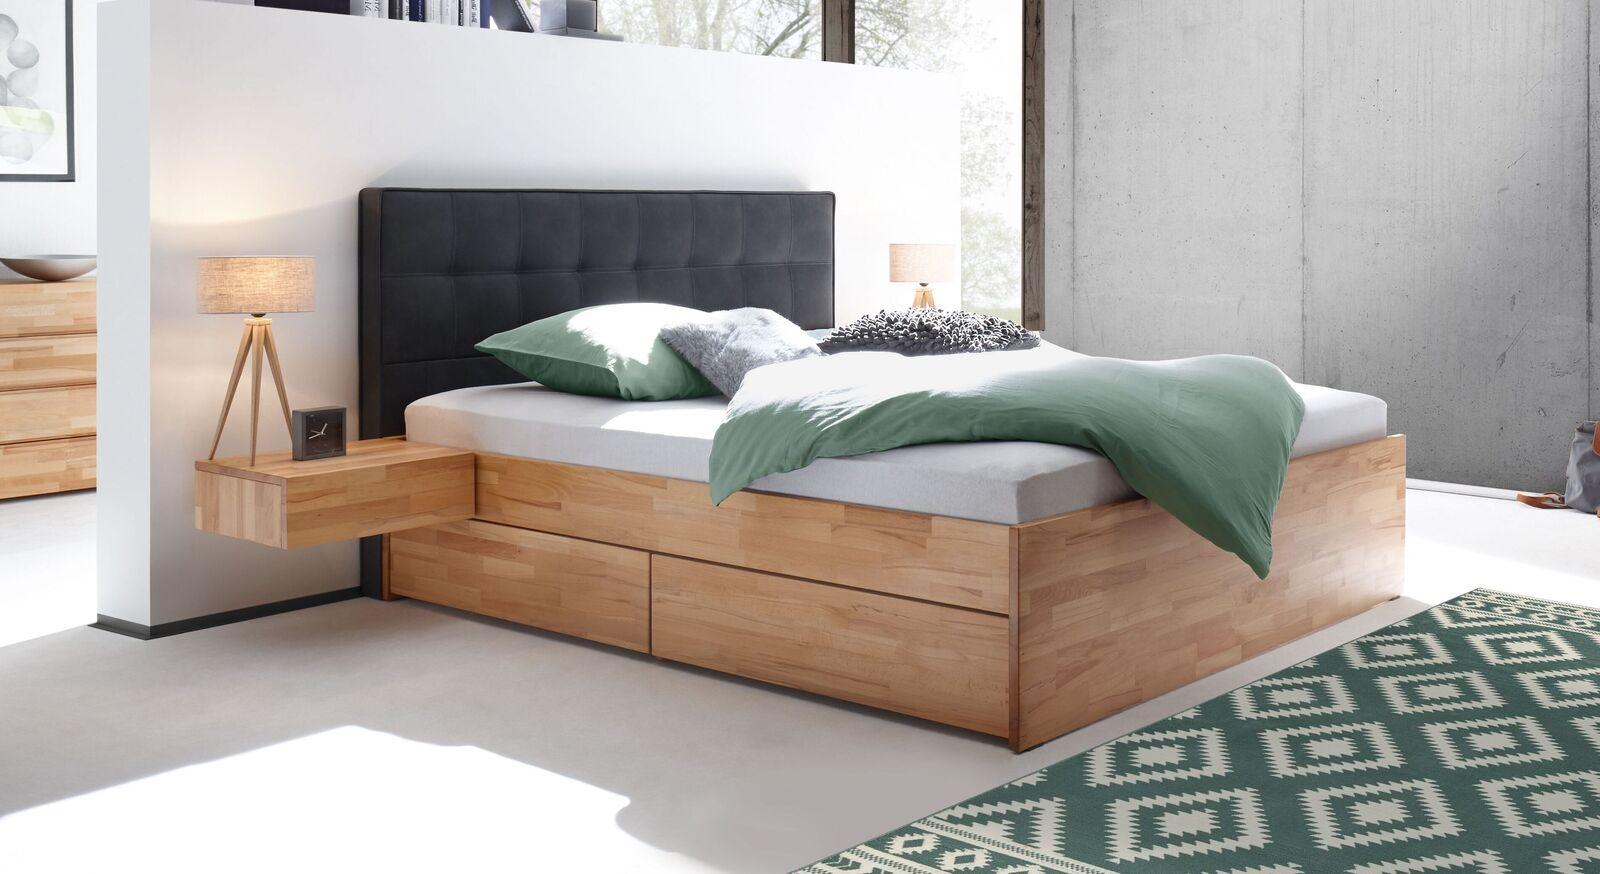 Schubkasten-Doppelbett Mirenda mit gestepptem Polster-Kopfteil